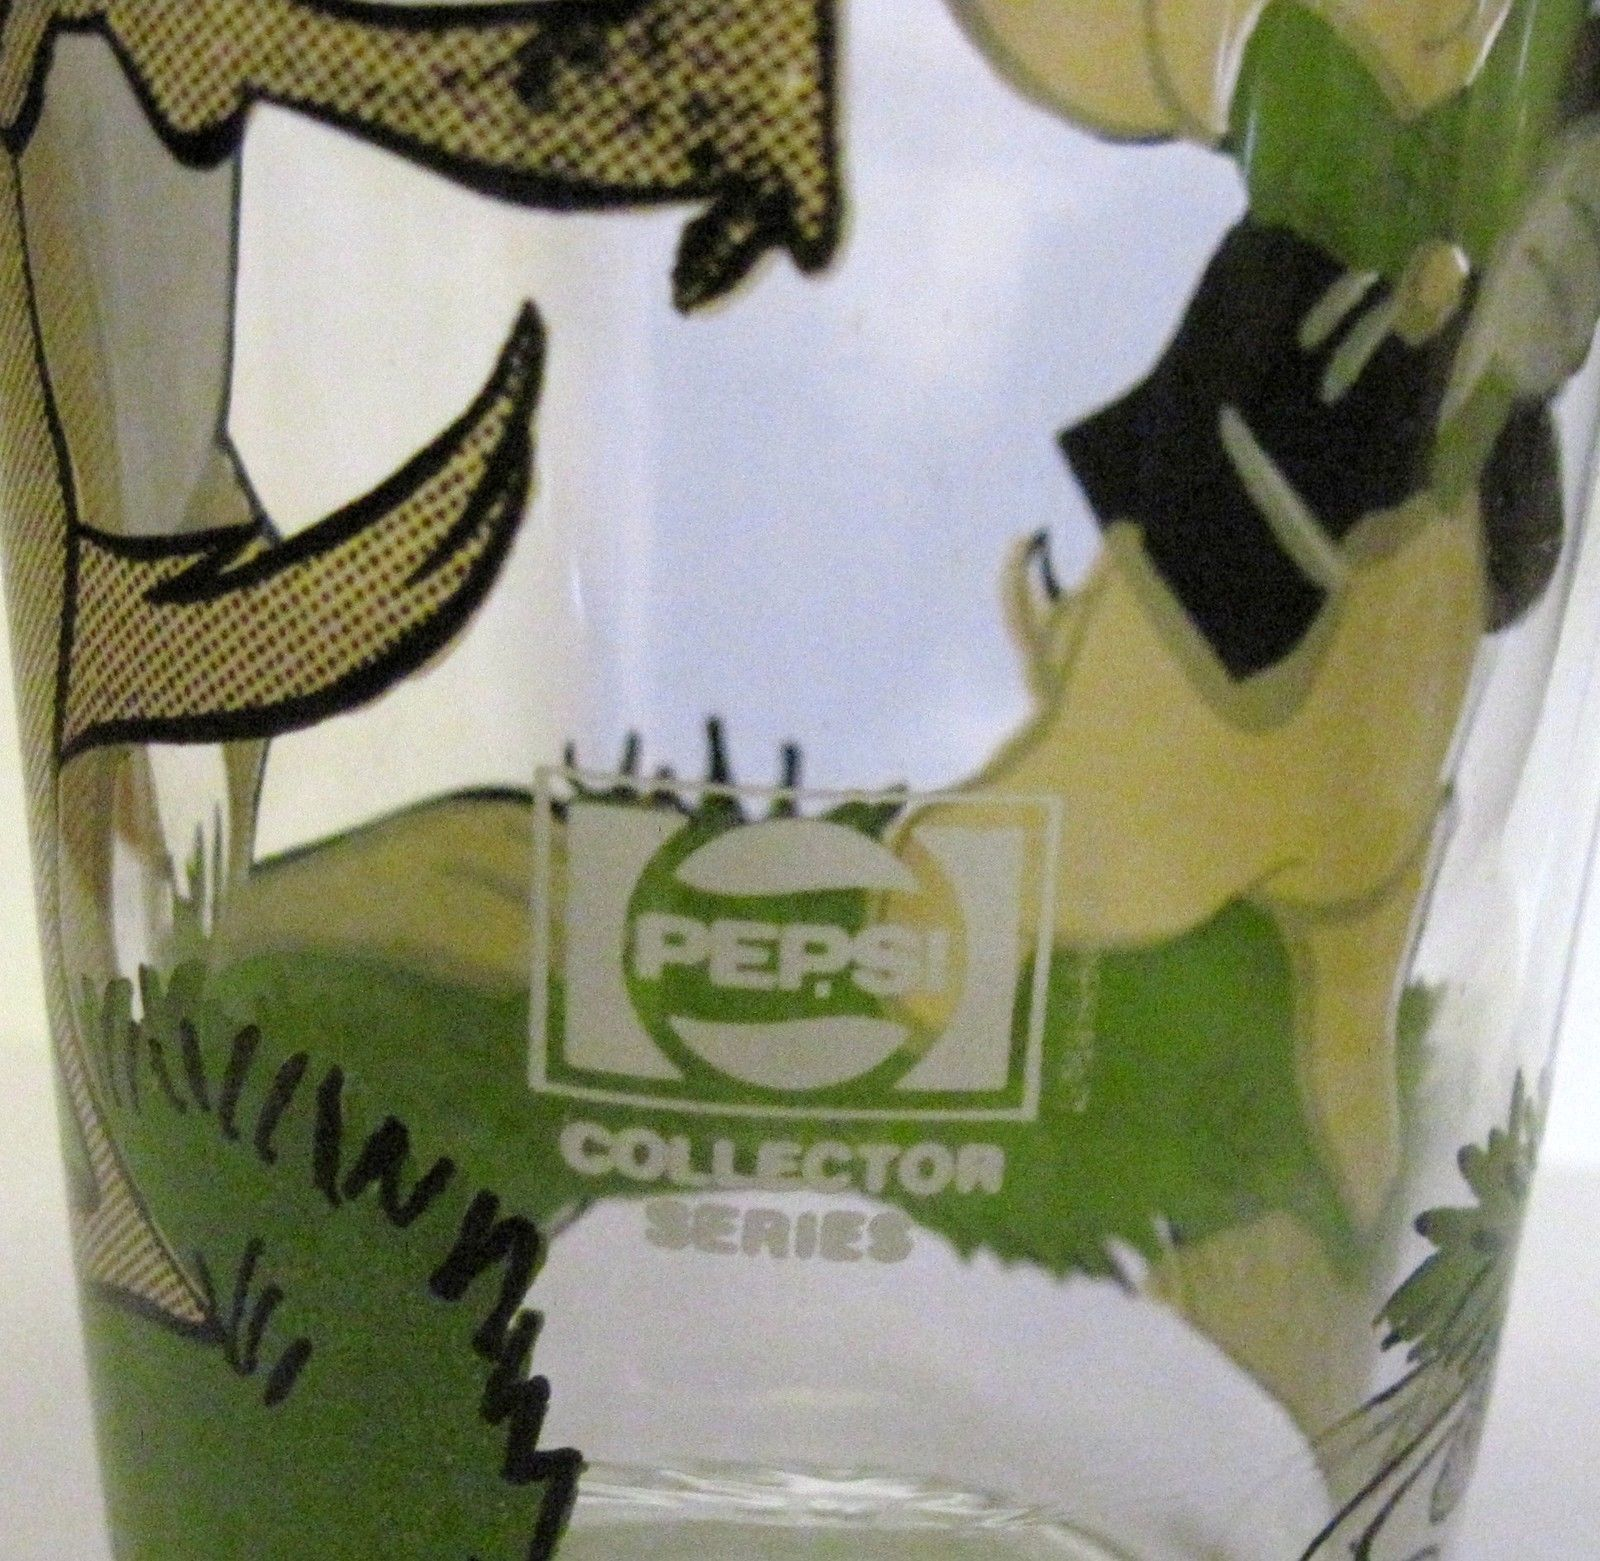 1976 PORKY PIG & TASMANIAN TAZ PEPSI COLLECTOR SERIES INTERACTION GLASS WARNER image 6